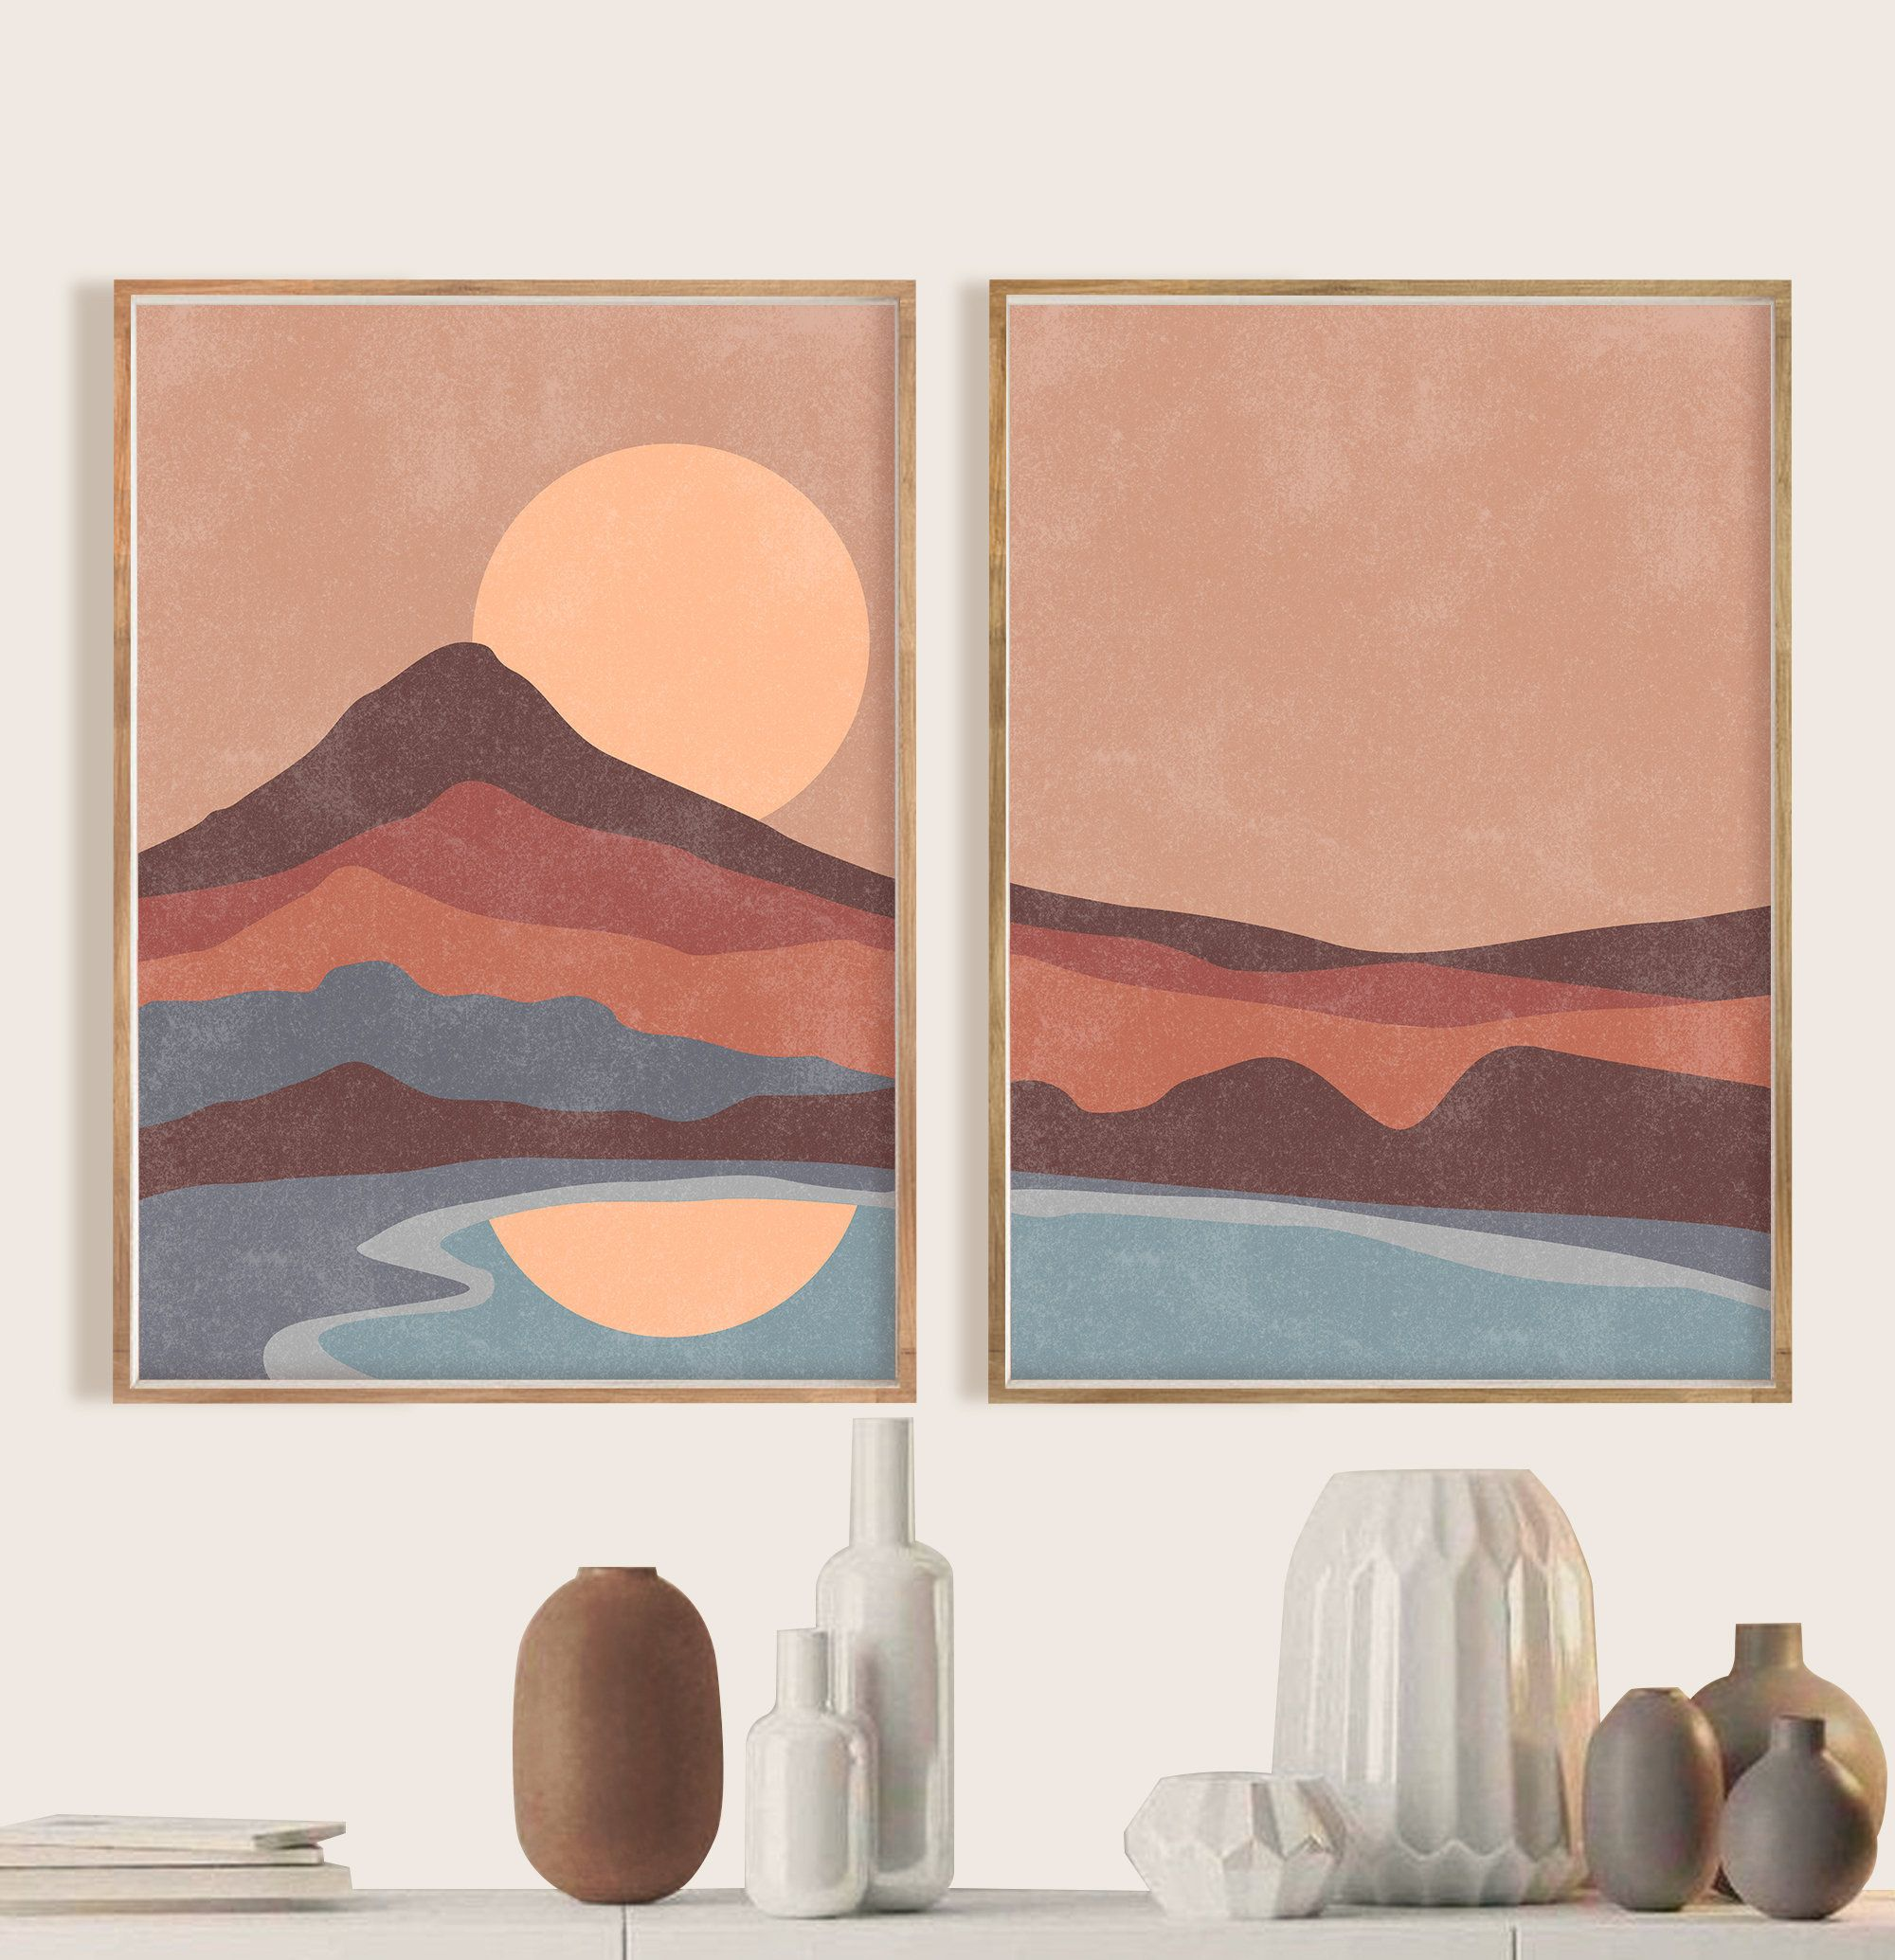 Mid Century Modern Printable Wall Art Digital Prints Boho Decor Wall Decor Abstract Art Print Downloadable Prints Mid Century Burnt Orange